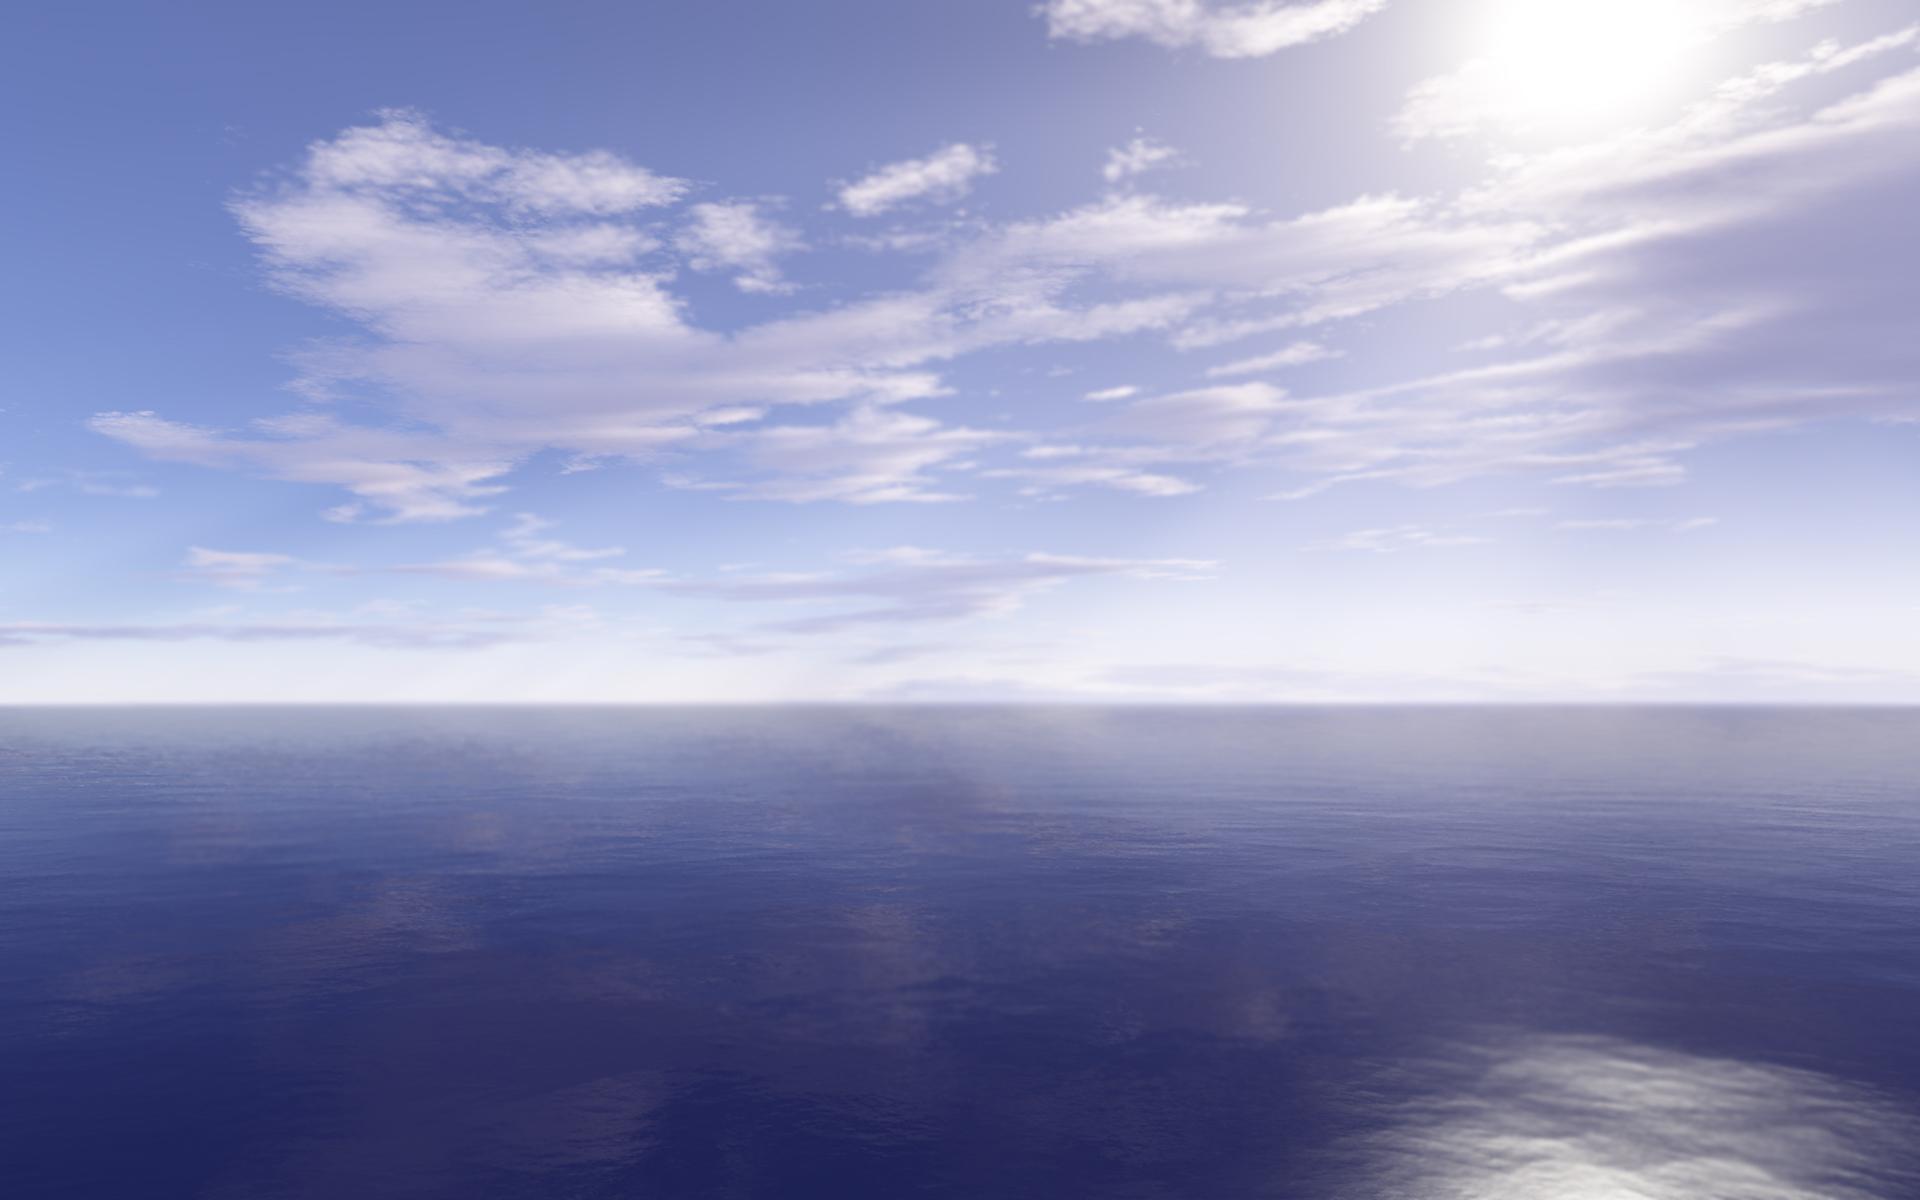 Seascape Backgrounds 1920x1200